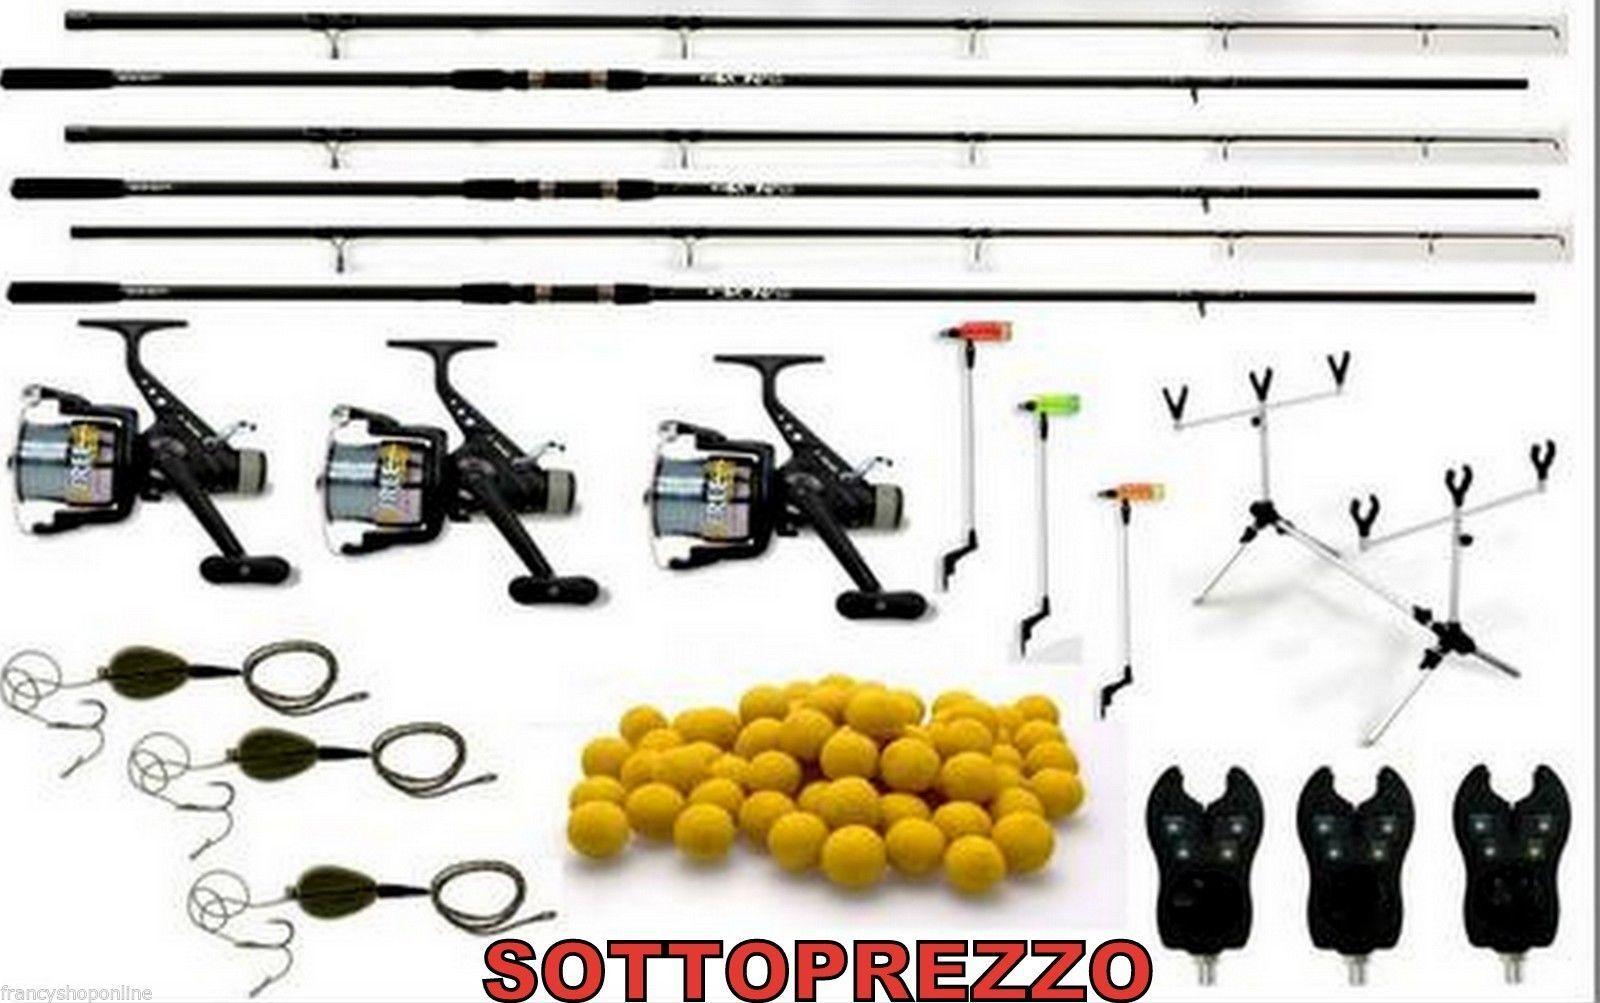 Kit autop fishing cannemulinelli  avvisatori acustici boilies rod pod PB2710